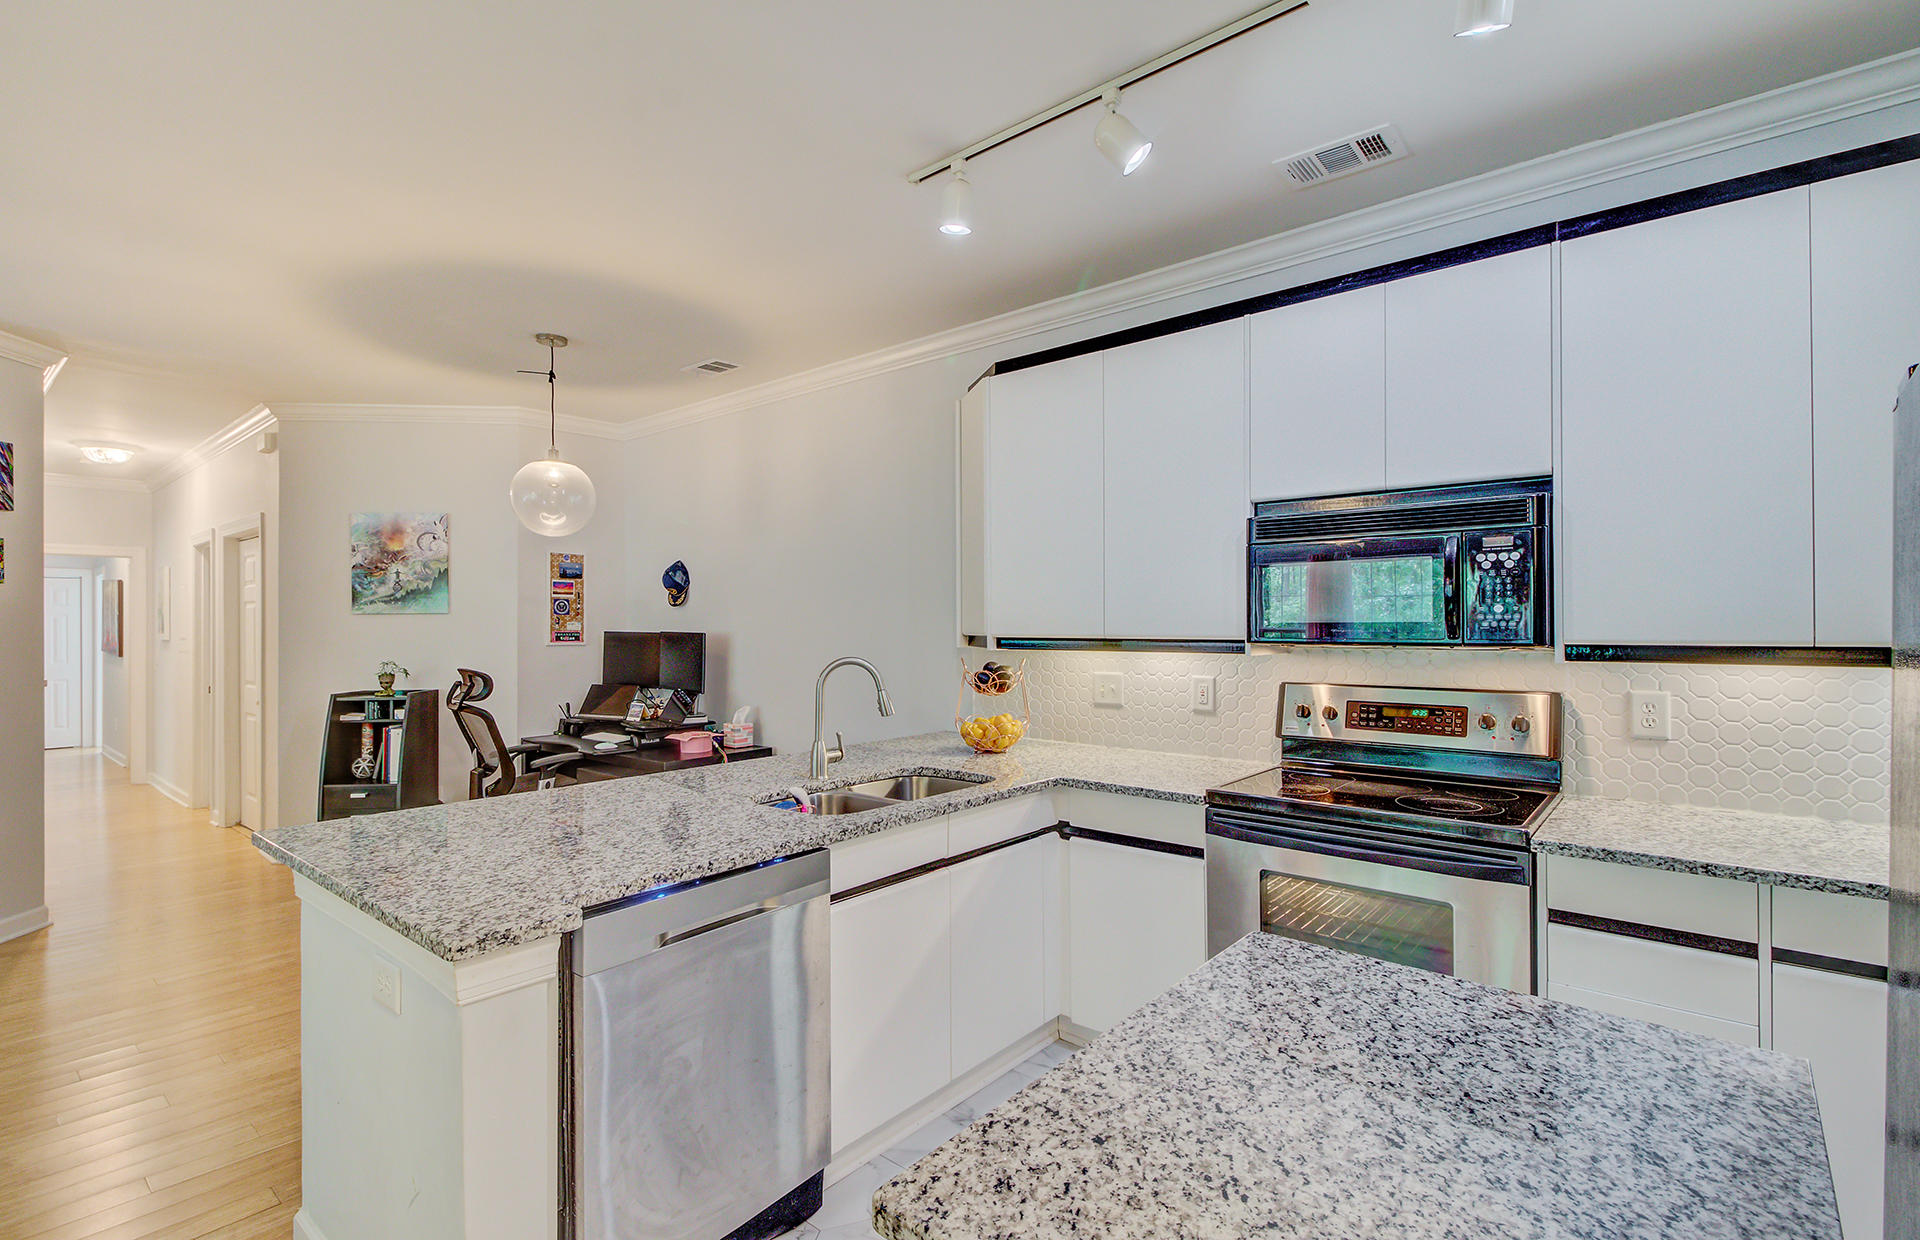 Dunes West Homes For Sale - 1566 Oxborough, Mount Pleasant, SC - 26